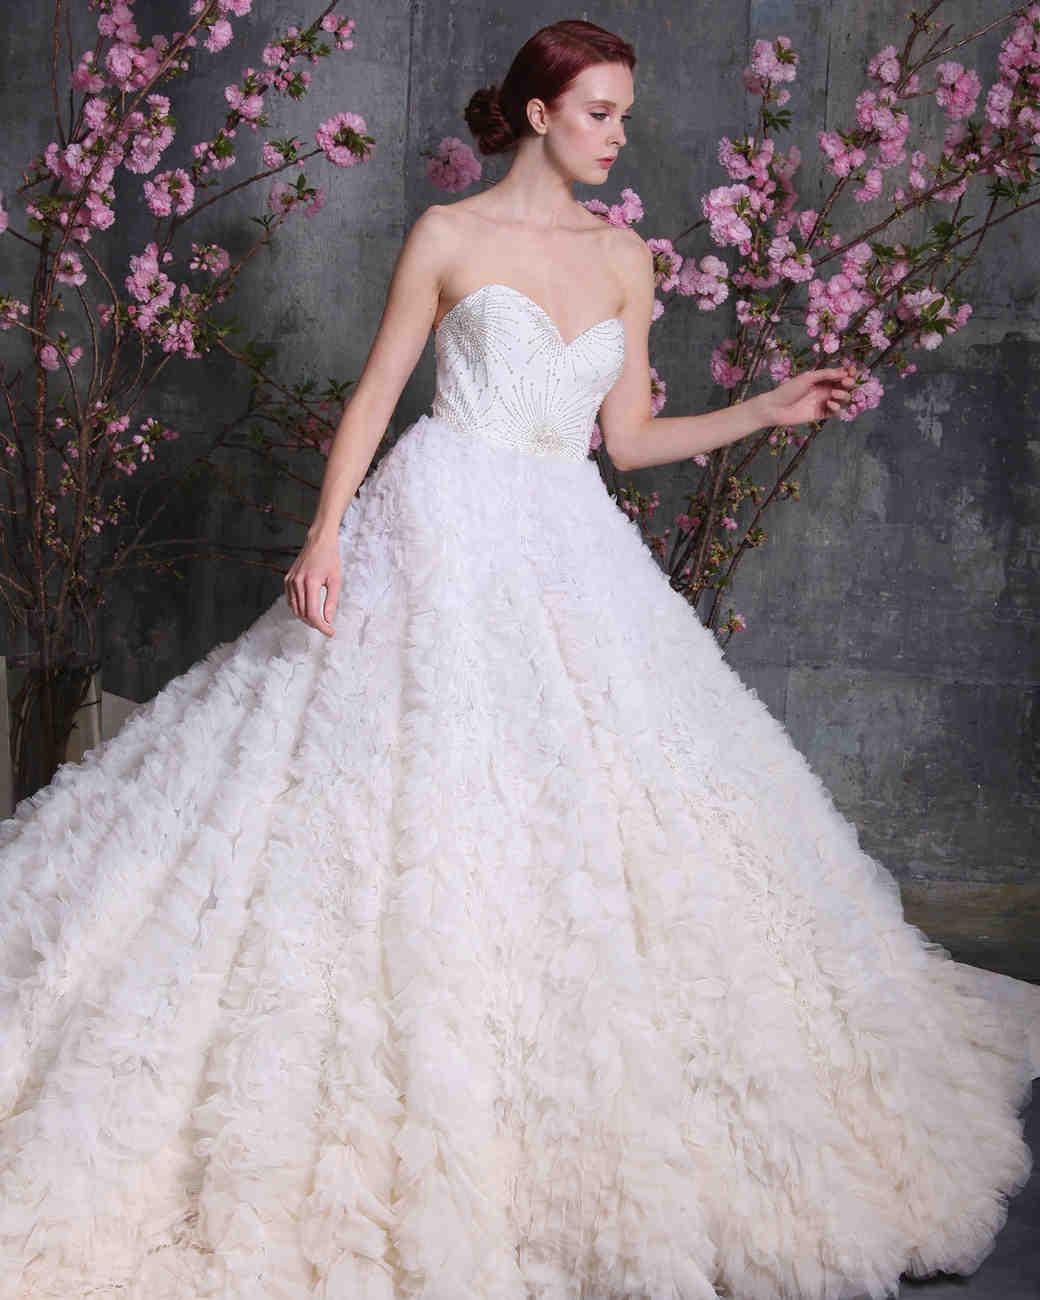 christian siriano dress spring 2018 sweetheart ruffles